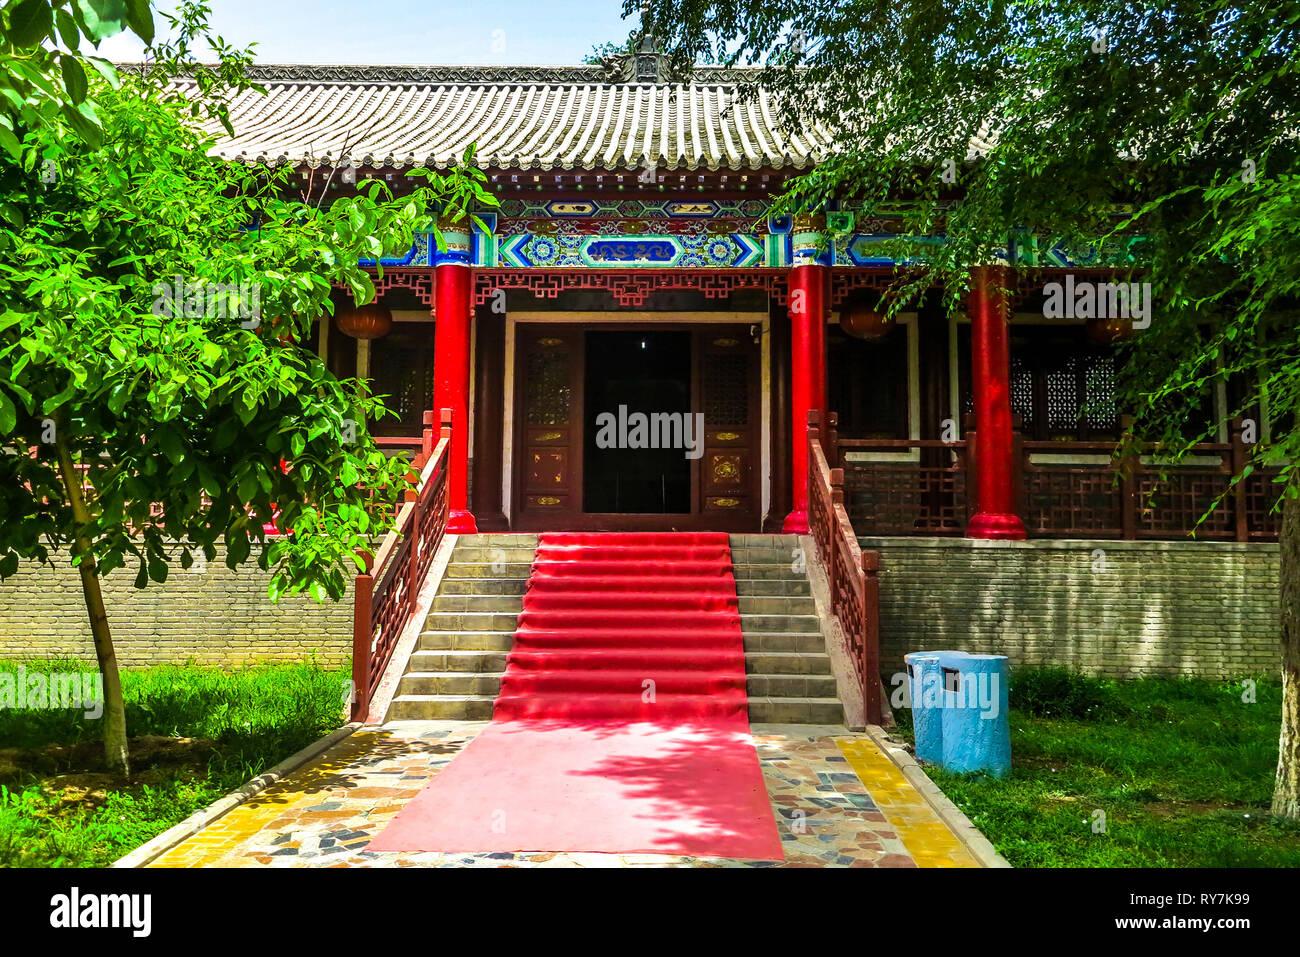 Kuche Royal King Palace Main Entrance to the Museum Pavilion - Stock Image